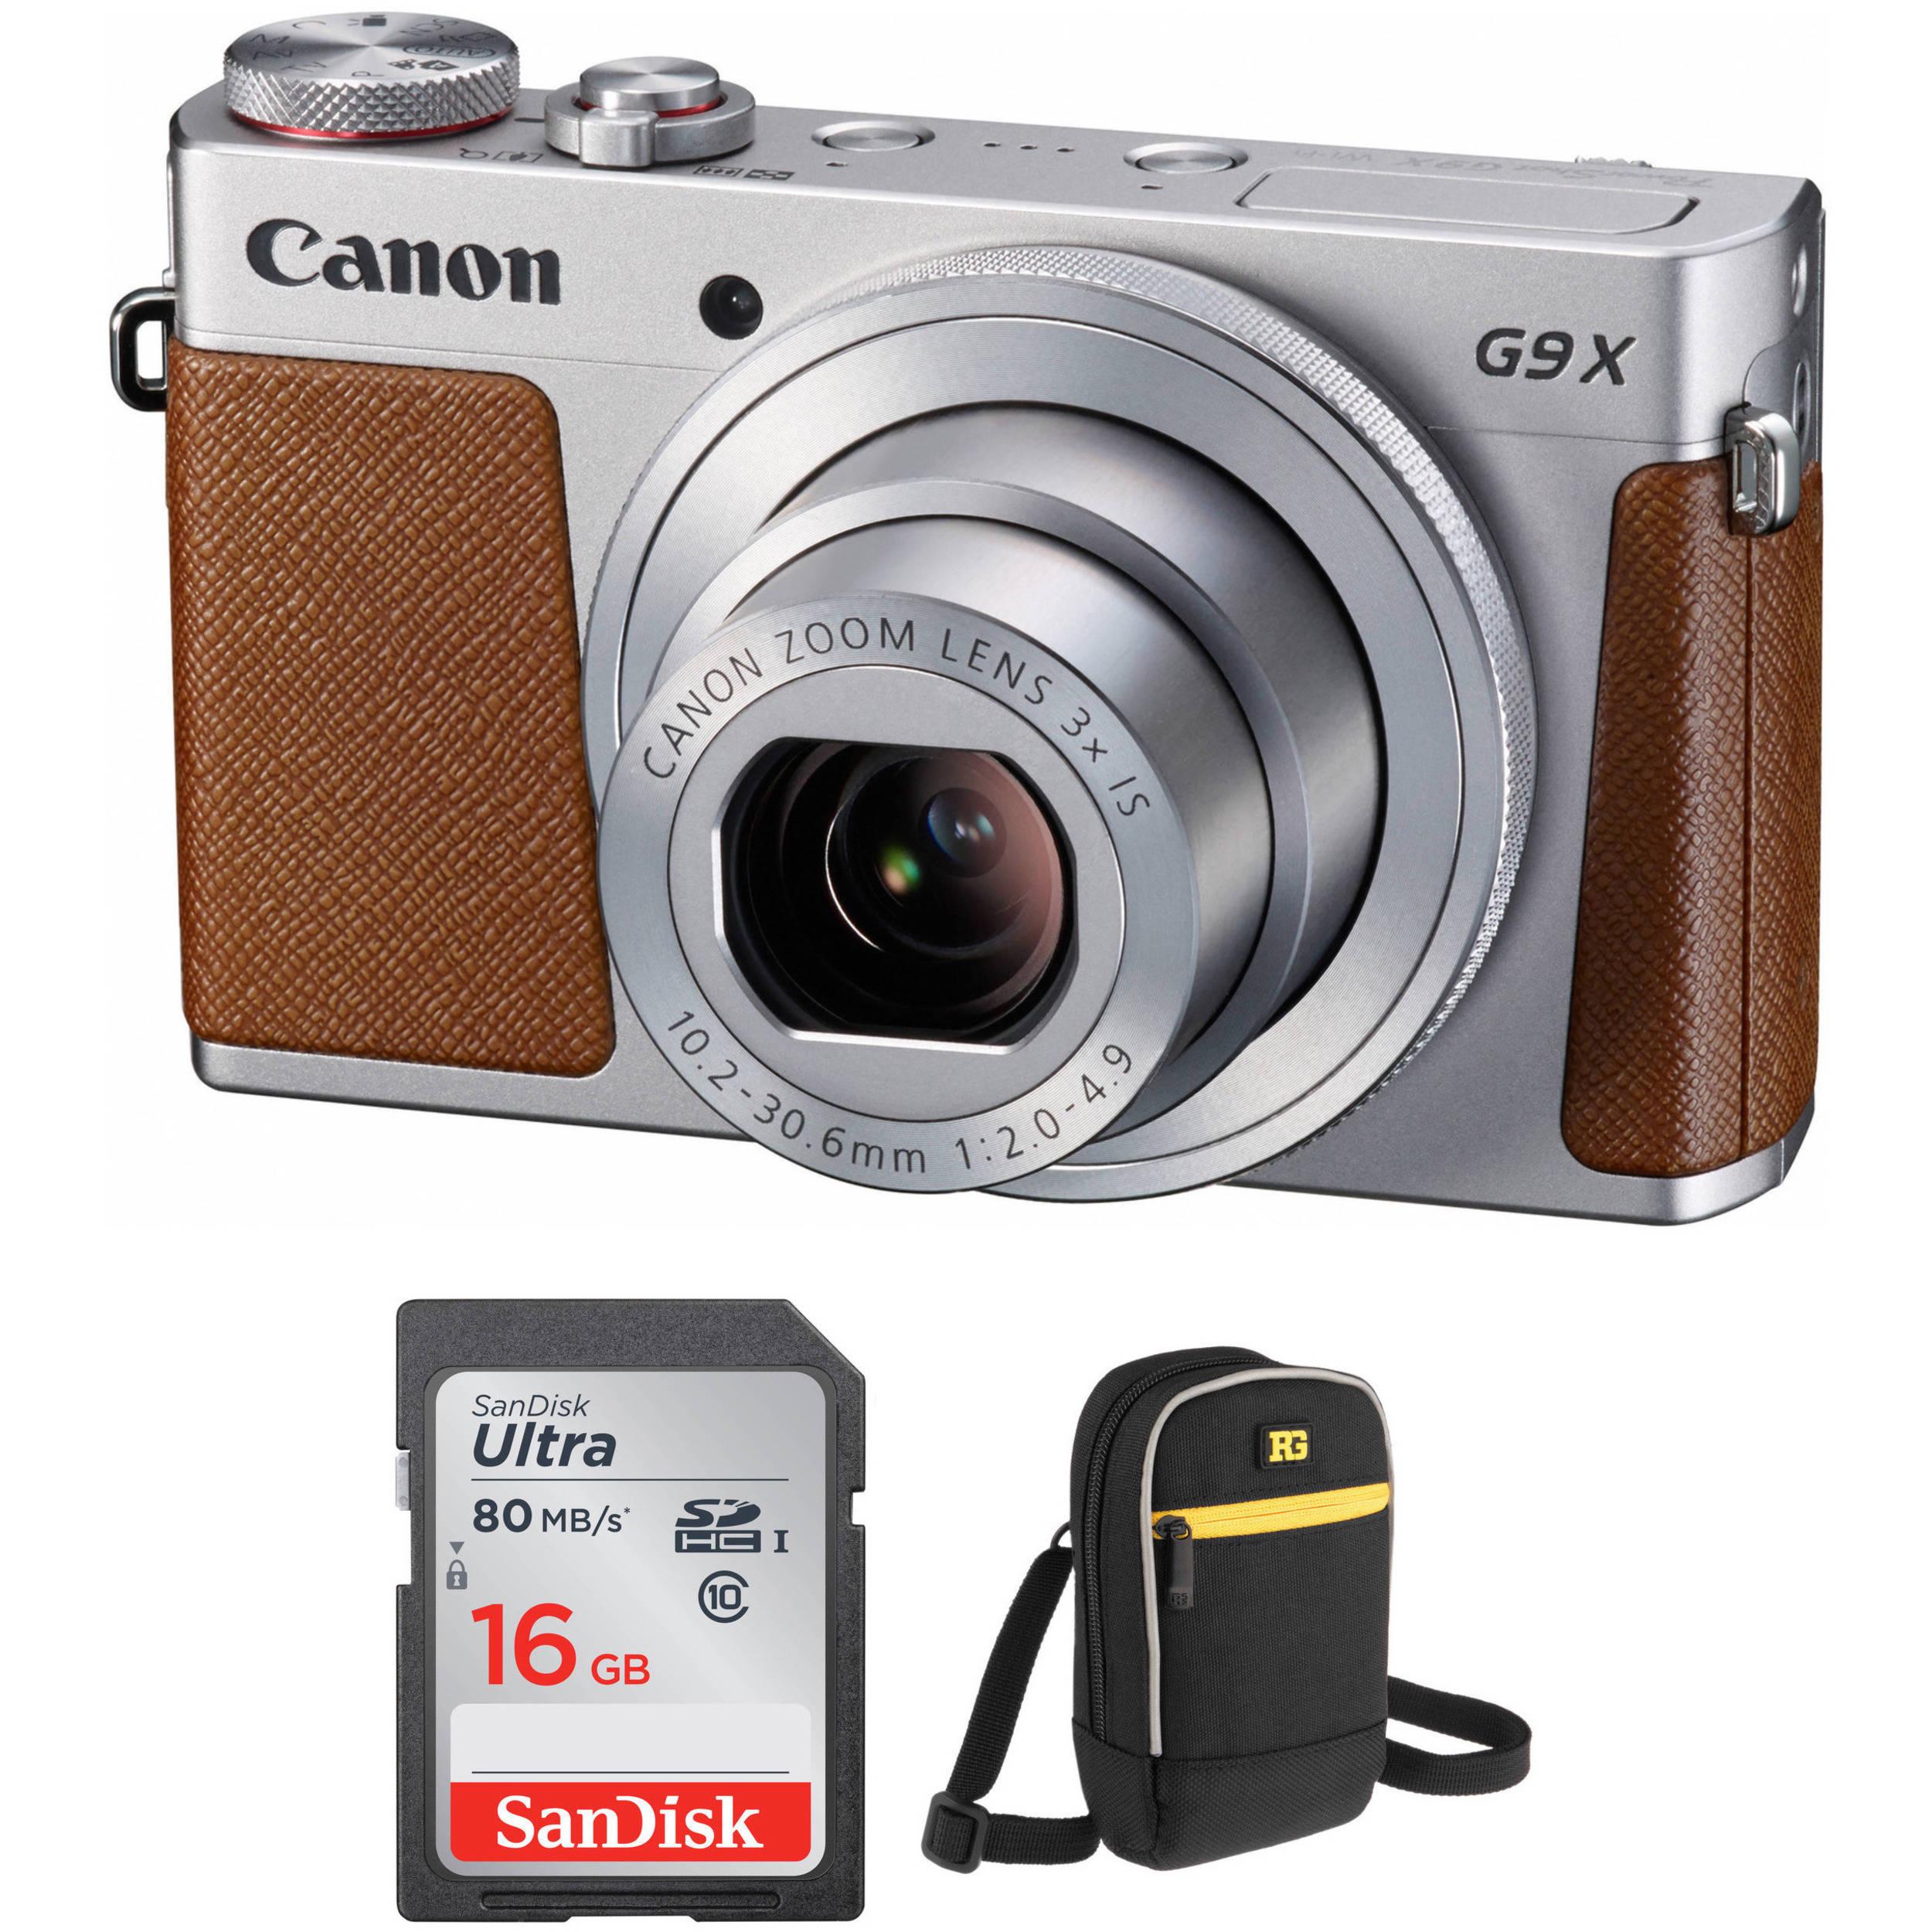 canon powershot g9 x digital camera accessory kit silver b h rh bhphotovideo com canon powershot g9 user manual canon g9 user manual pdf